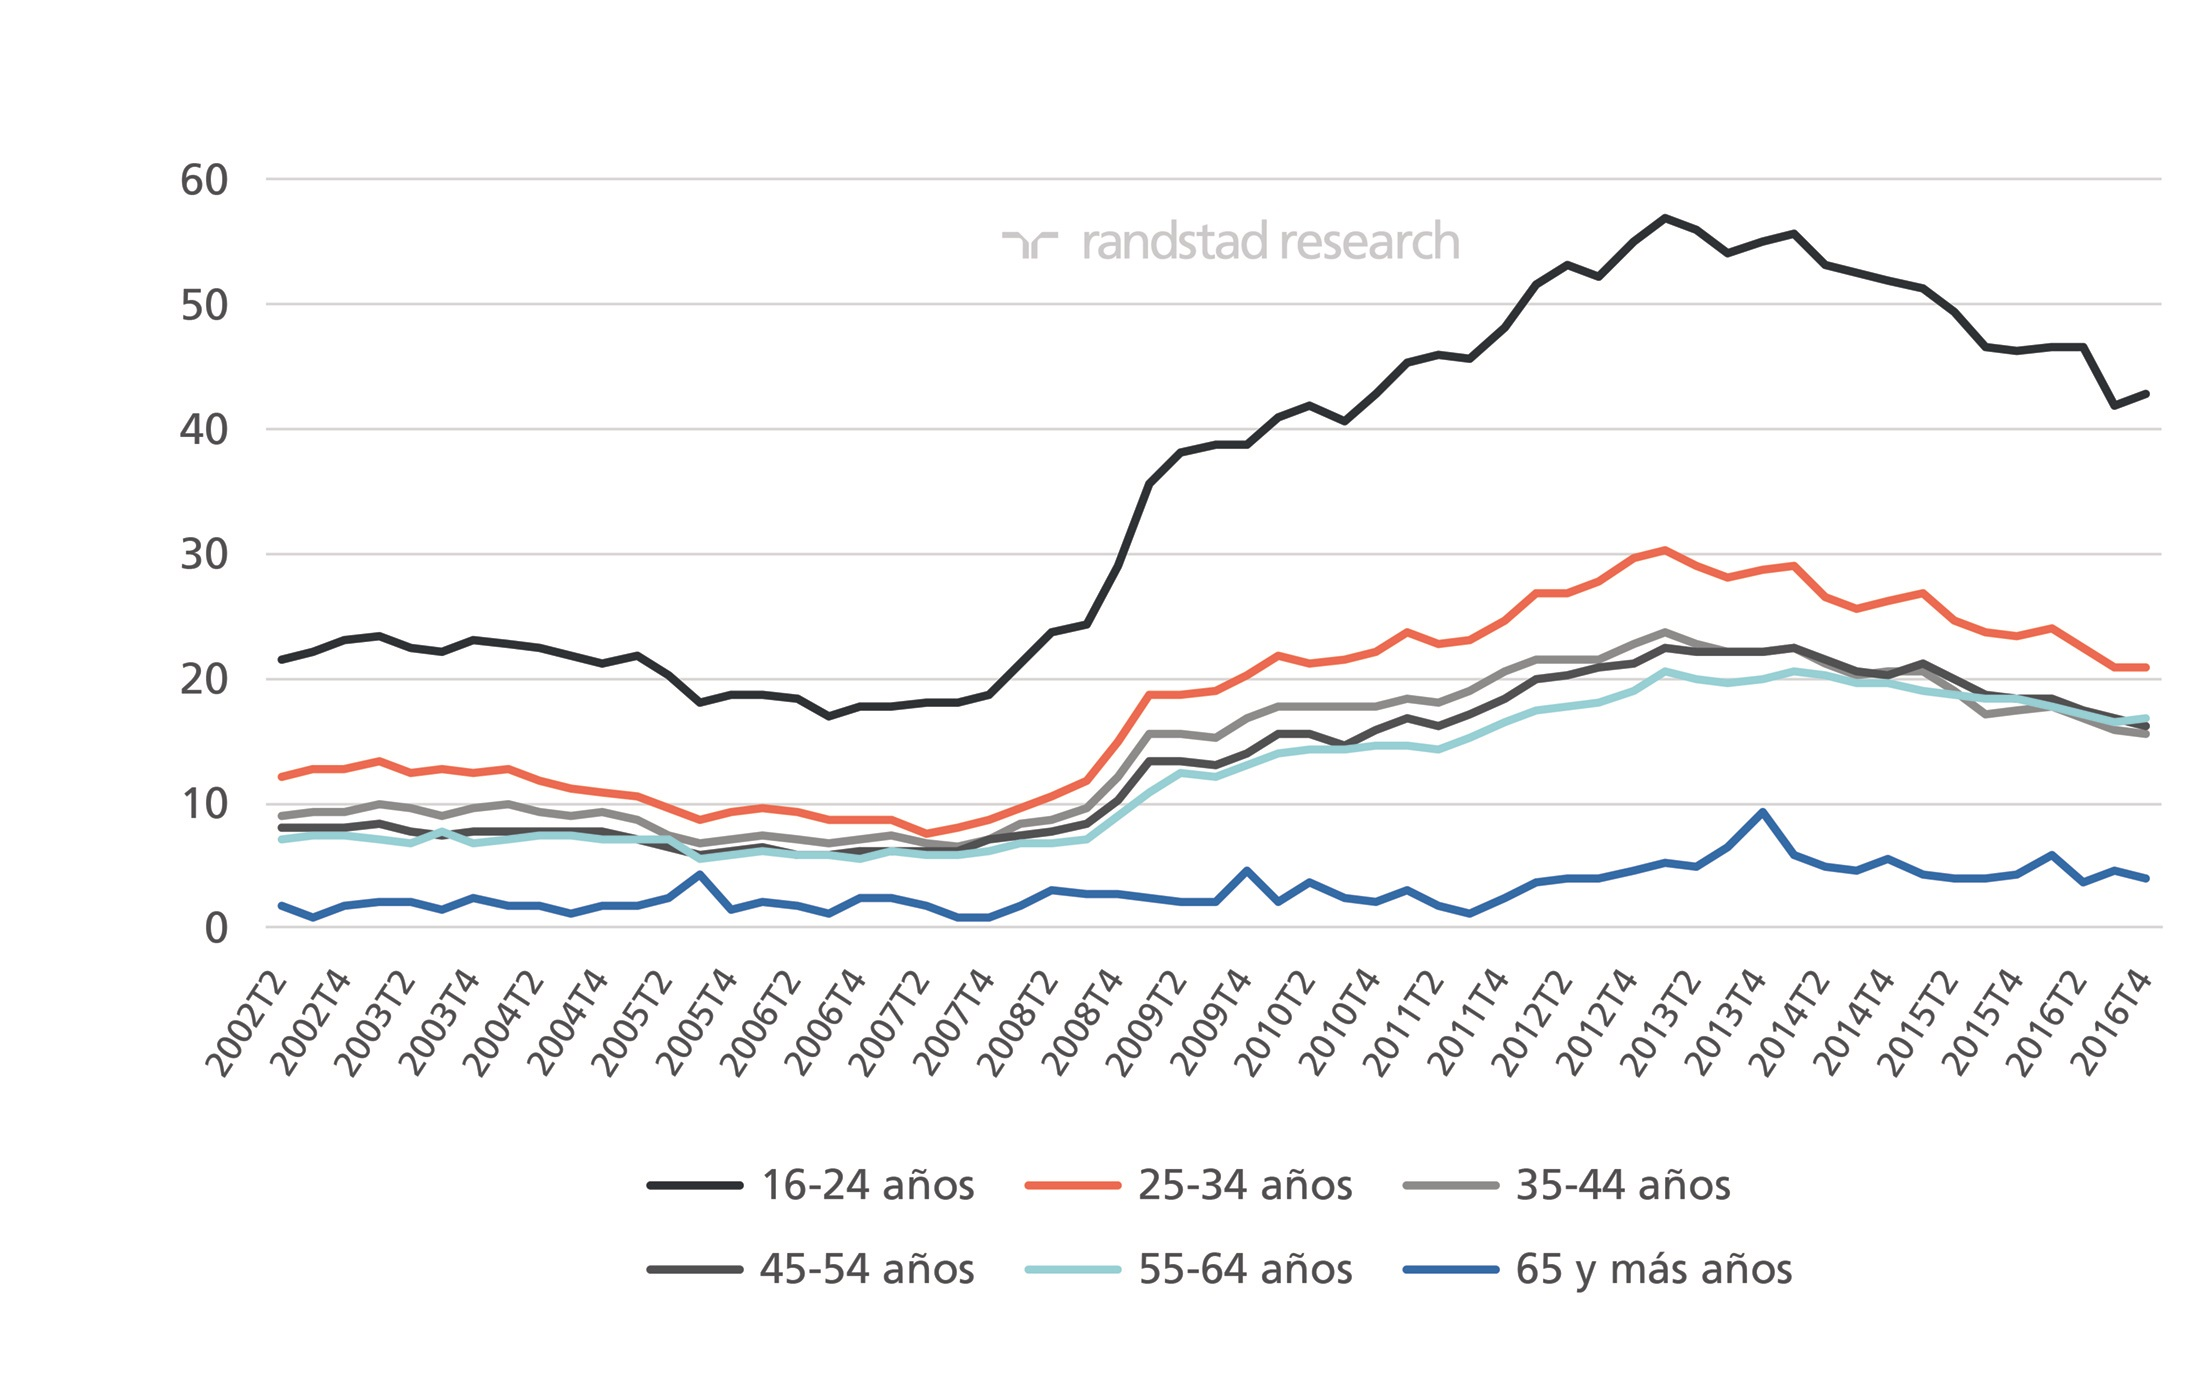 Datos epa cuatro trimestre 2016